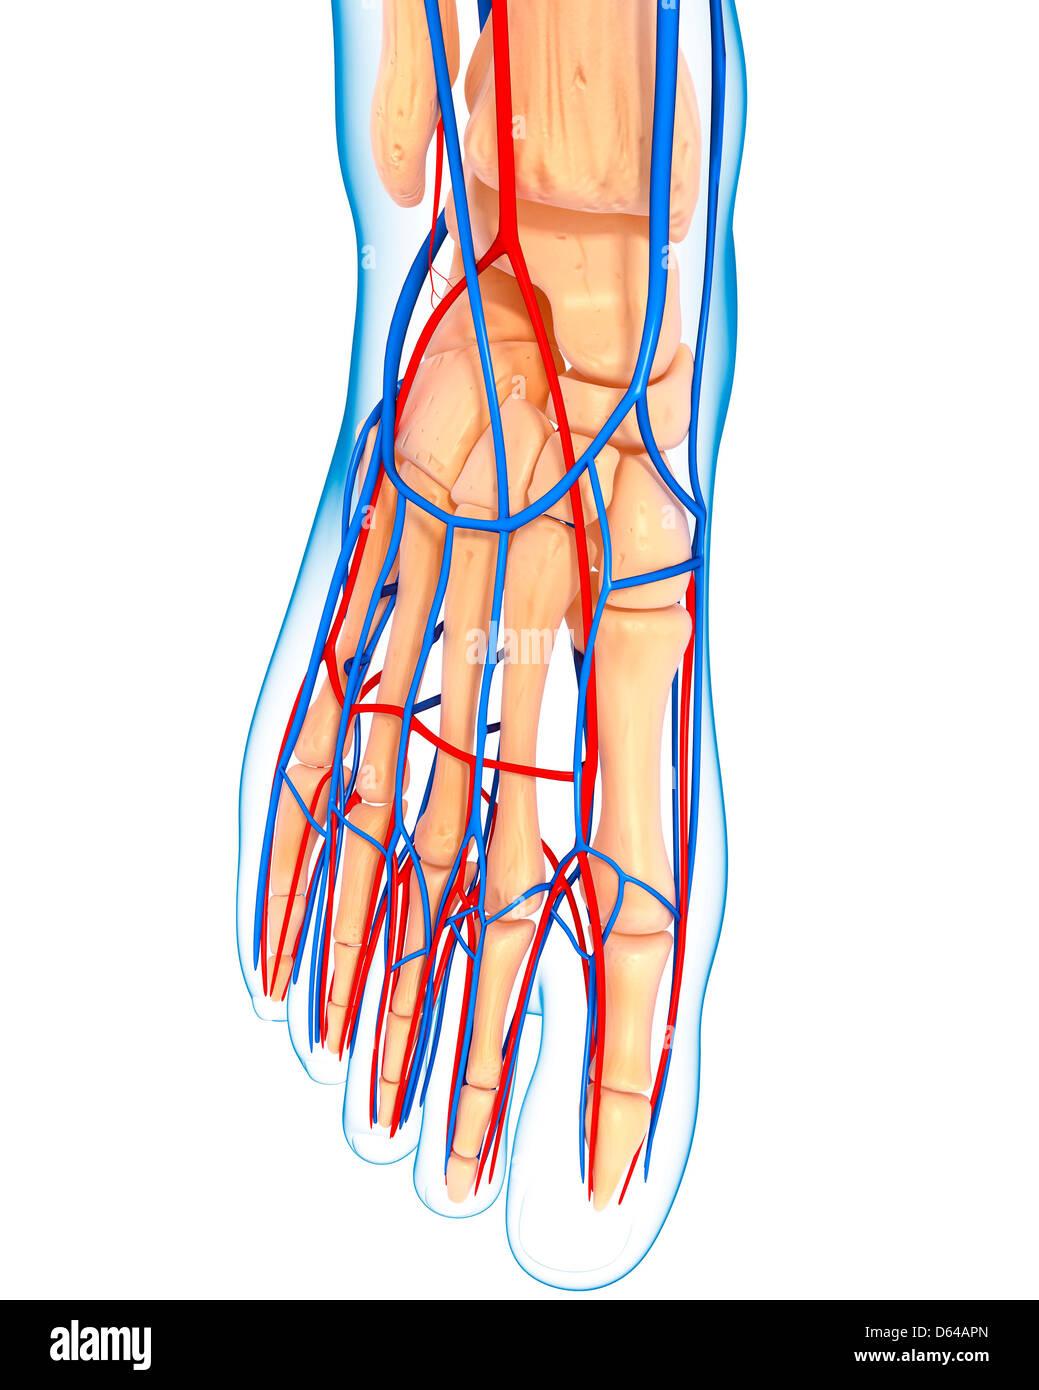 Human Vascular System Foot Imágenes De Stock & Human Vascular System ...